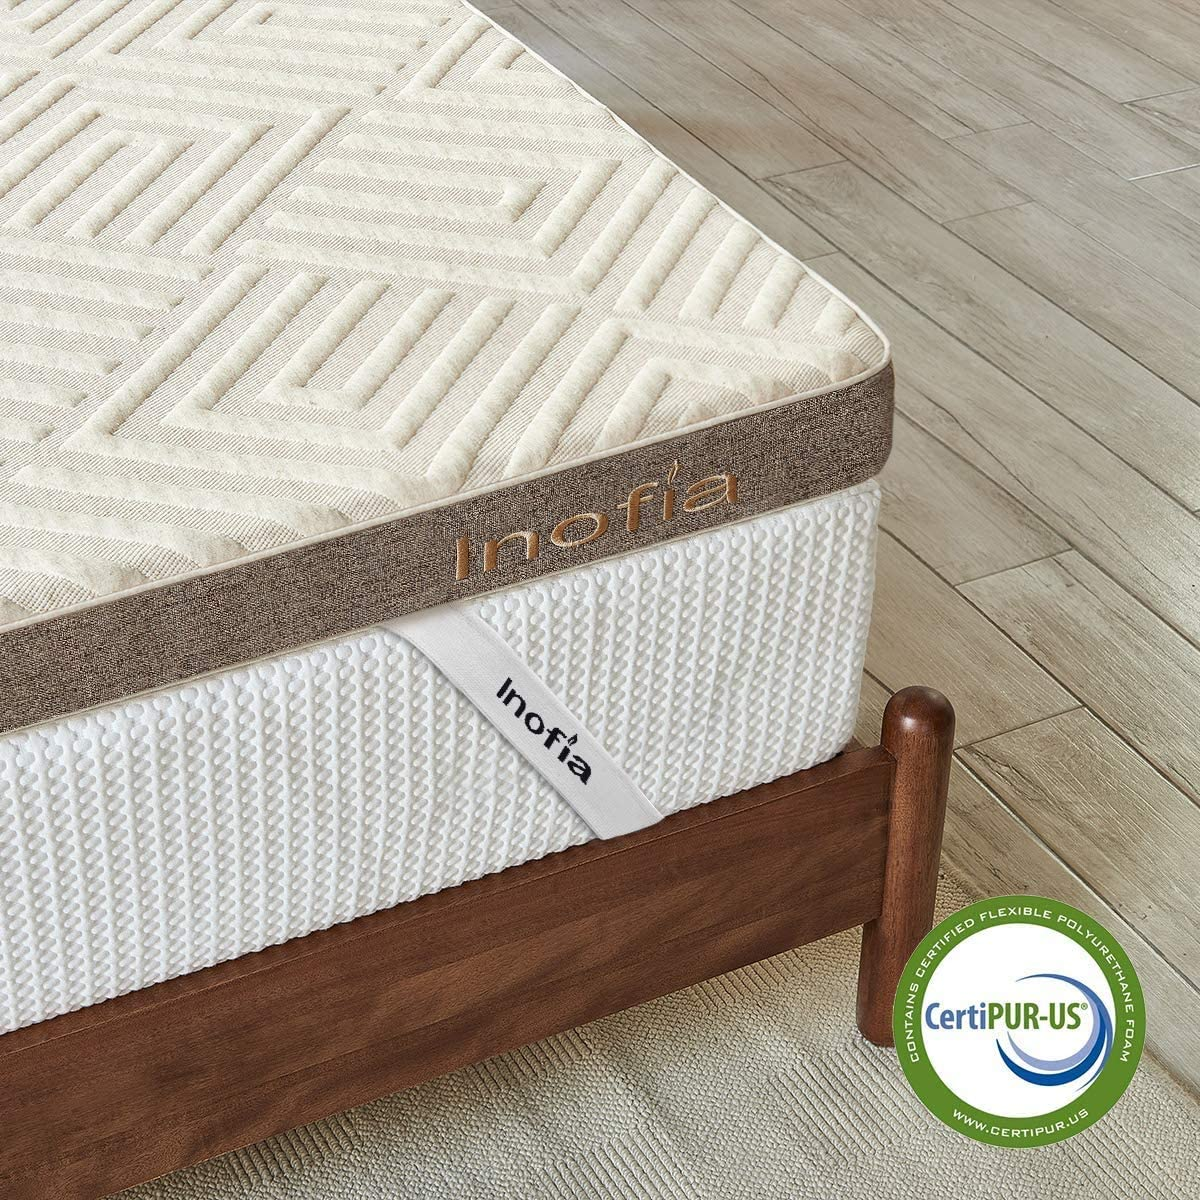 Inofia Latex Memory Foam Mattress Topper, 2cm Latex Memory Foam + 6cm Charcoal Support Foam,Mattress Topper with Linen Fabic Washable Cover, Pressure Relief, 100-Night Risk-Free Trial (140x200cm)